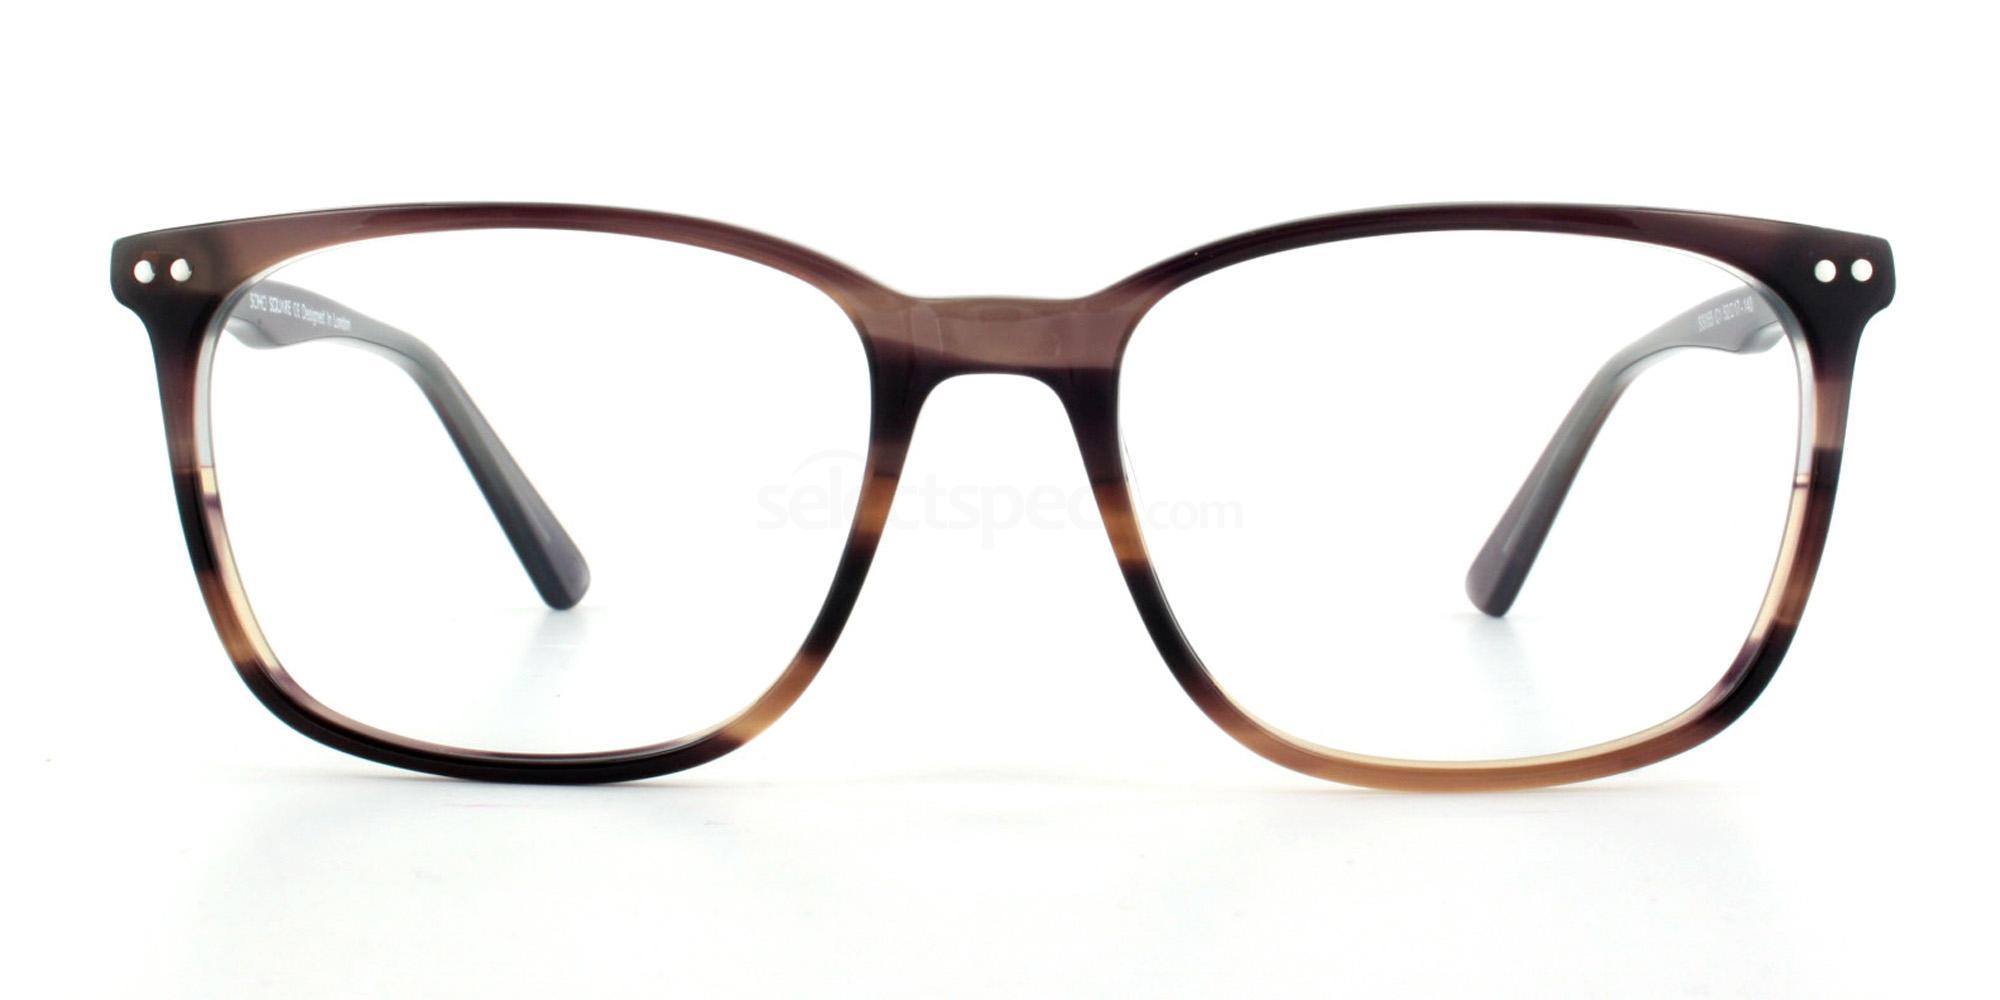 C1 SS 055 Glasses, Soho Square